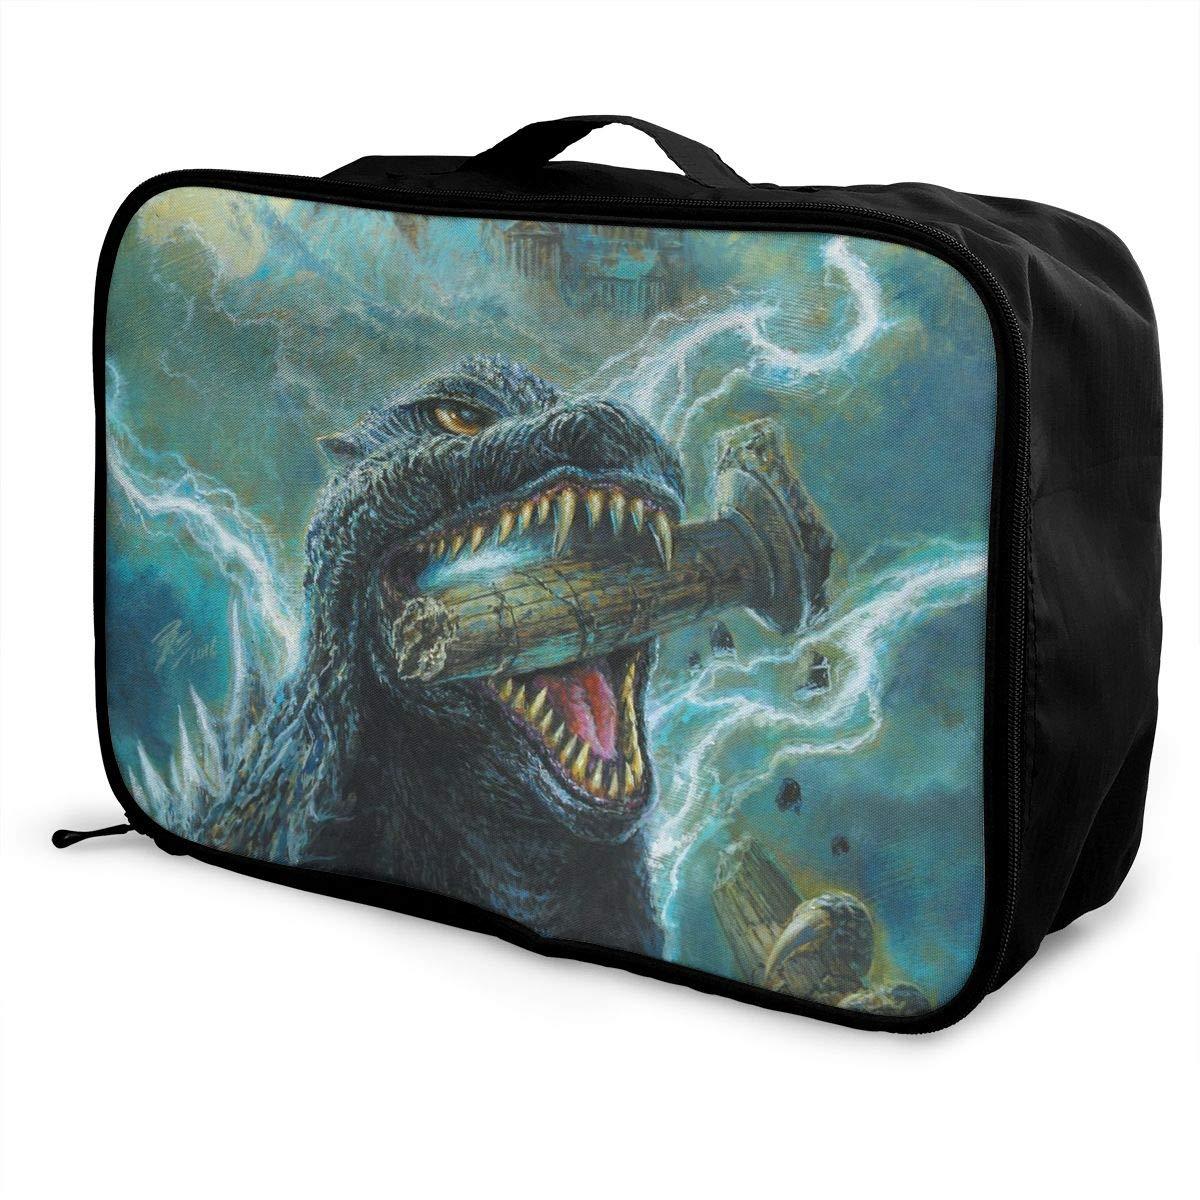 BOKAIKAI1306 Kong Godzilla Unisex Adults Fashion Lightweight Large Capacity Portable Large Travel Duffel Bag Mens Woman Luggage Bag 3D Print Custom Boarding Box